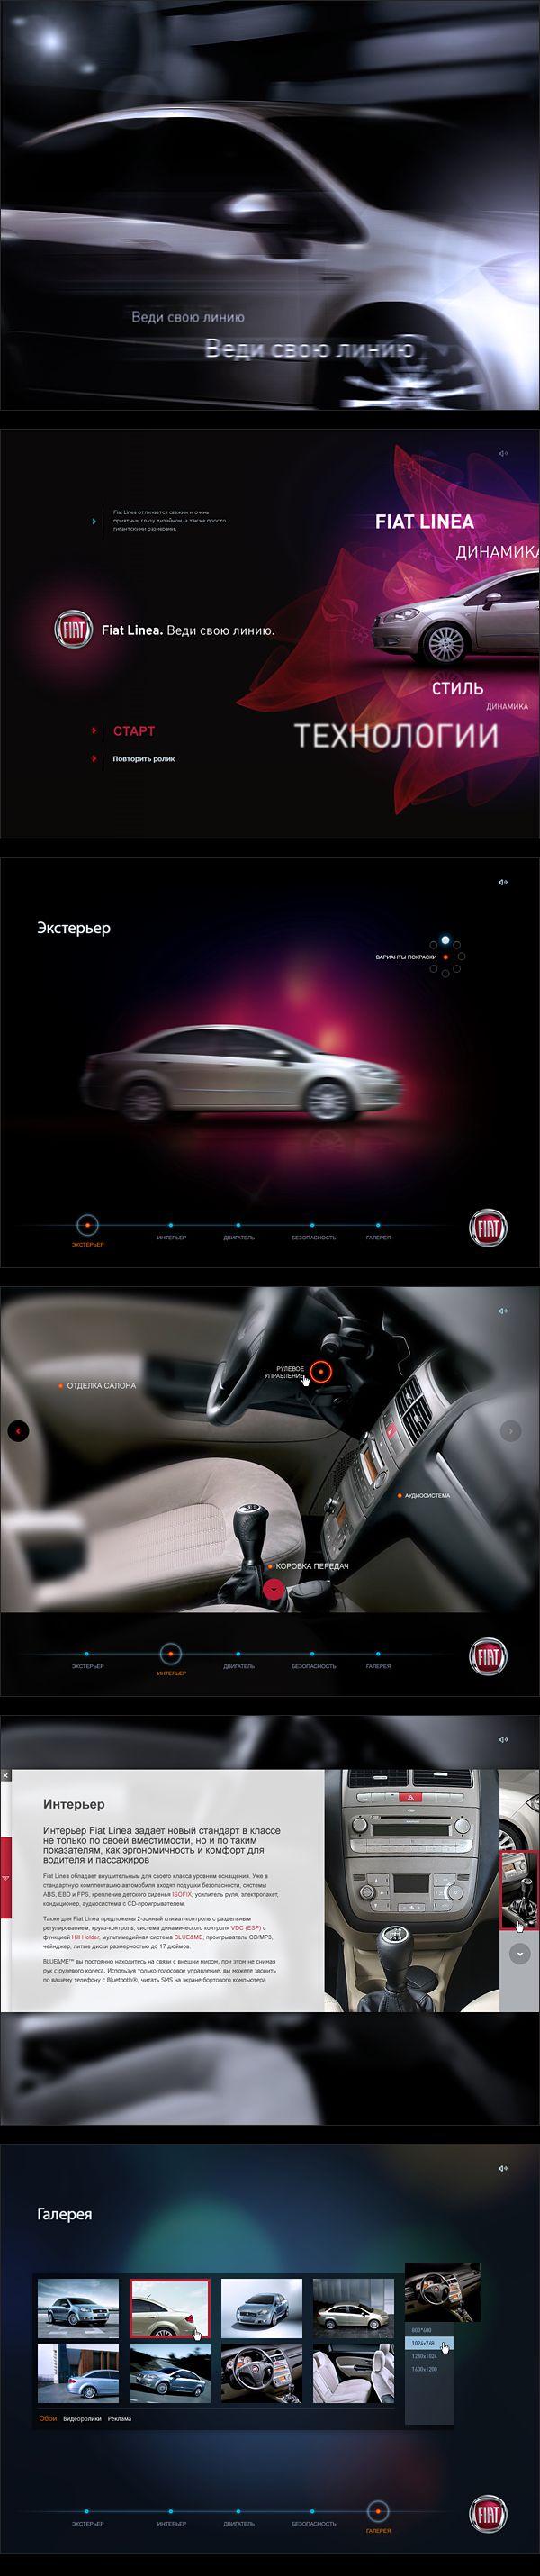 Fiat Linea  presentation by Kravtsov Studio